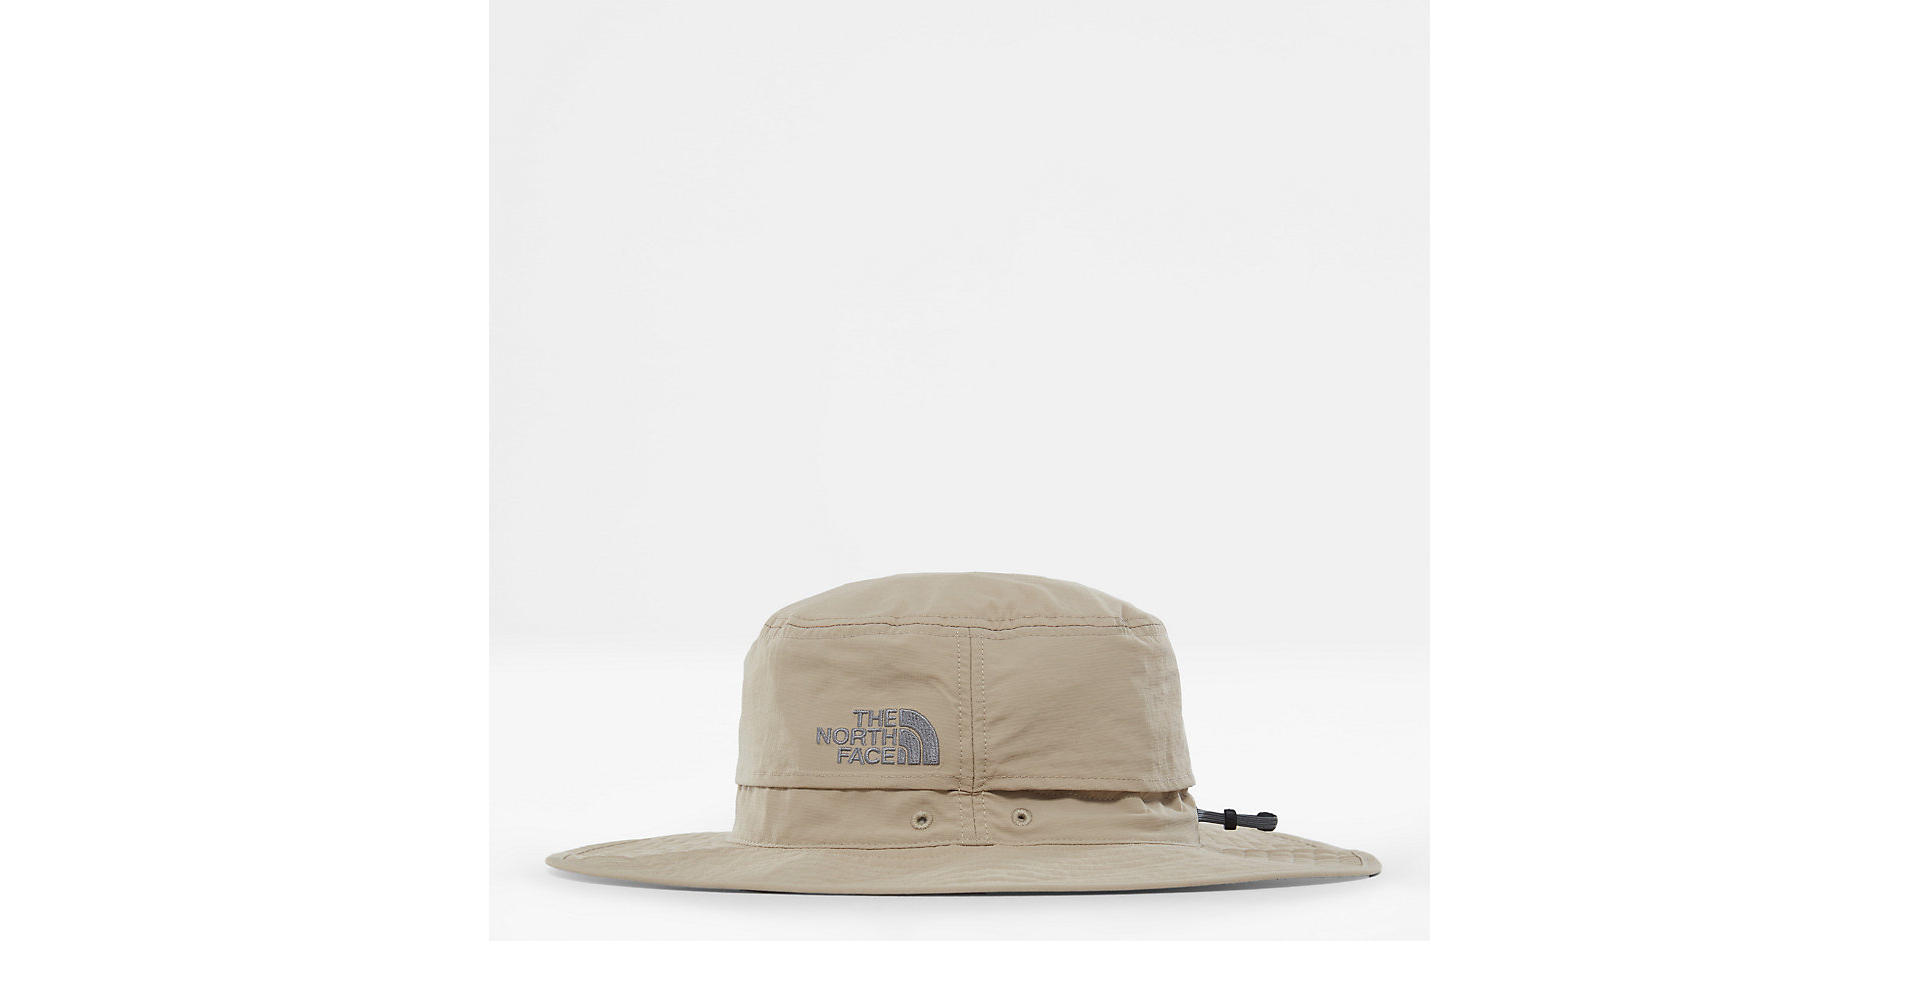 52b039901f411 The North Face Horizon Breeze Brimmer Hat (Dune Beige) - Summits